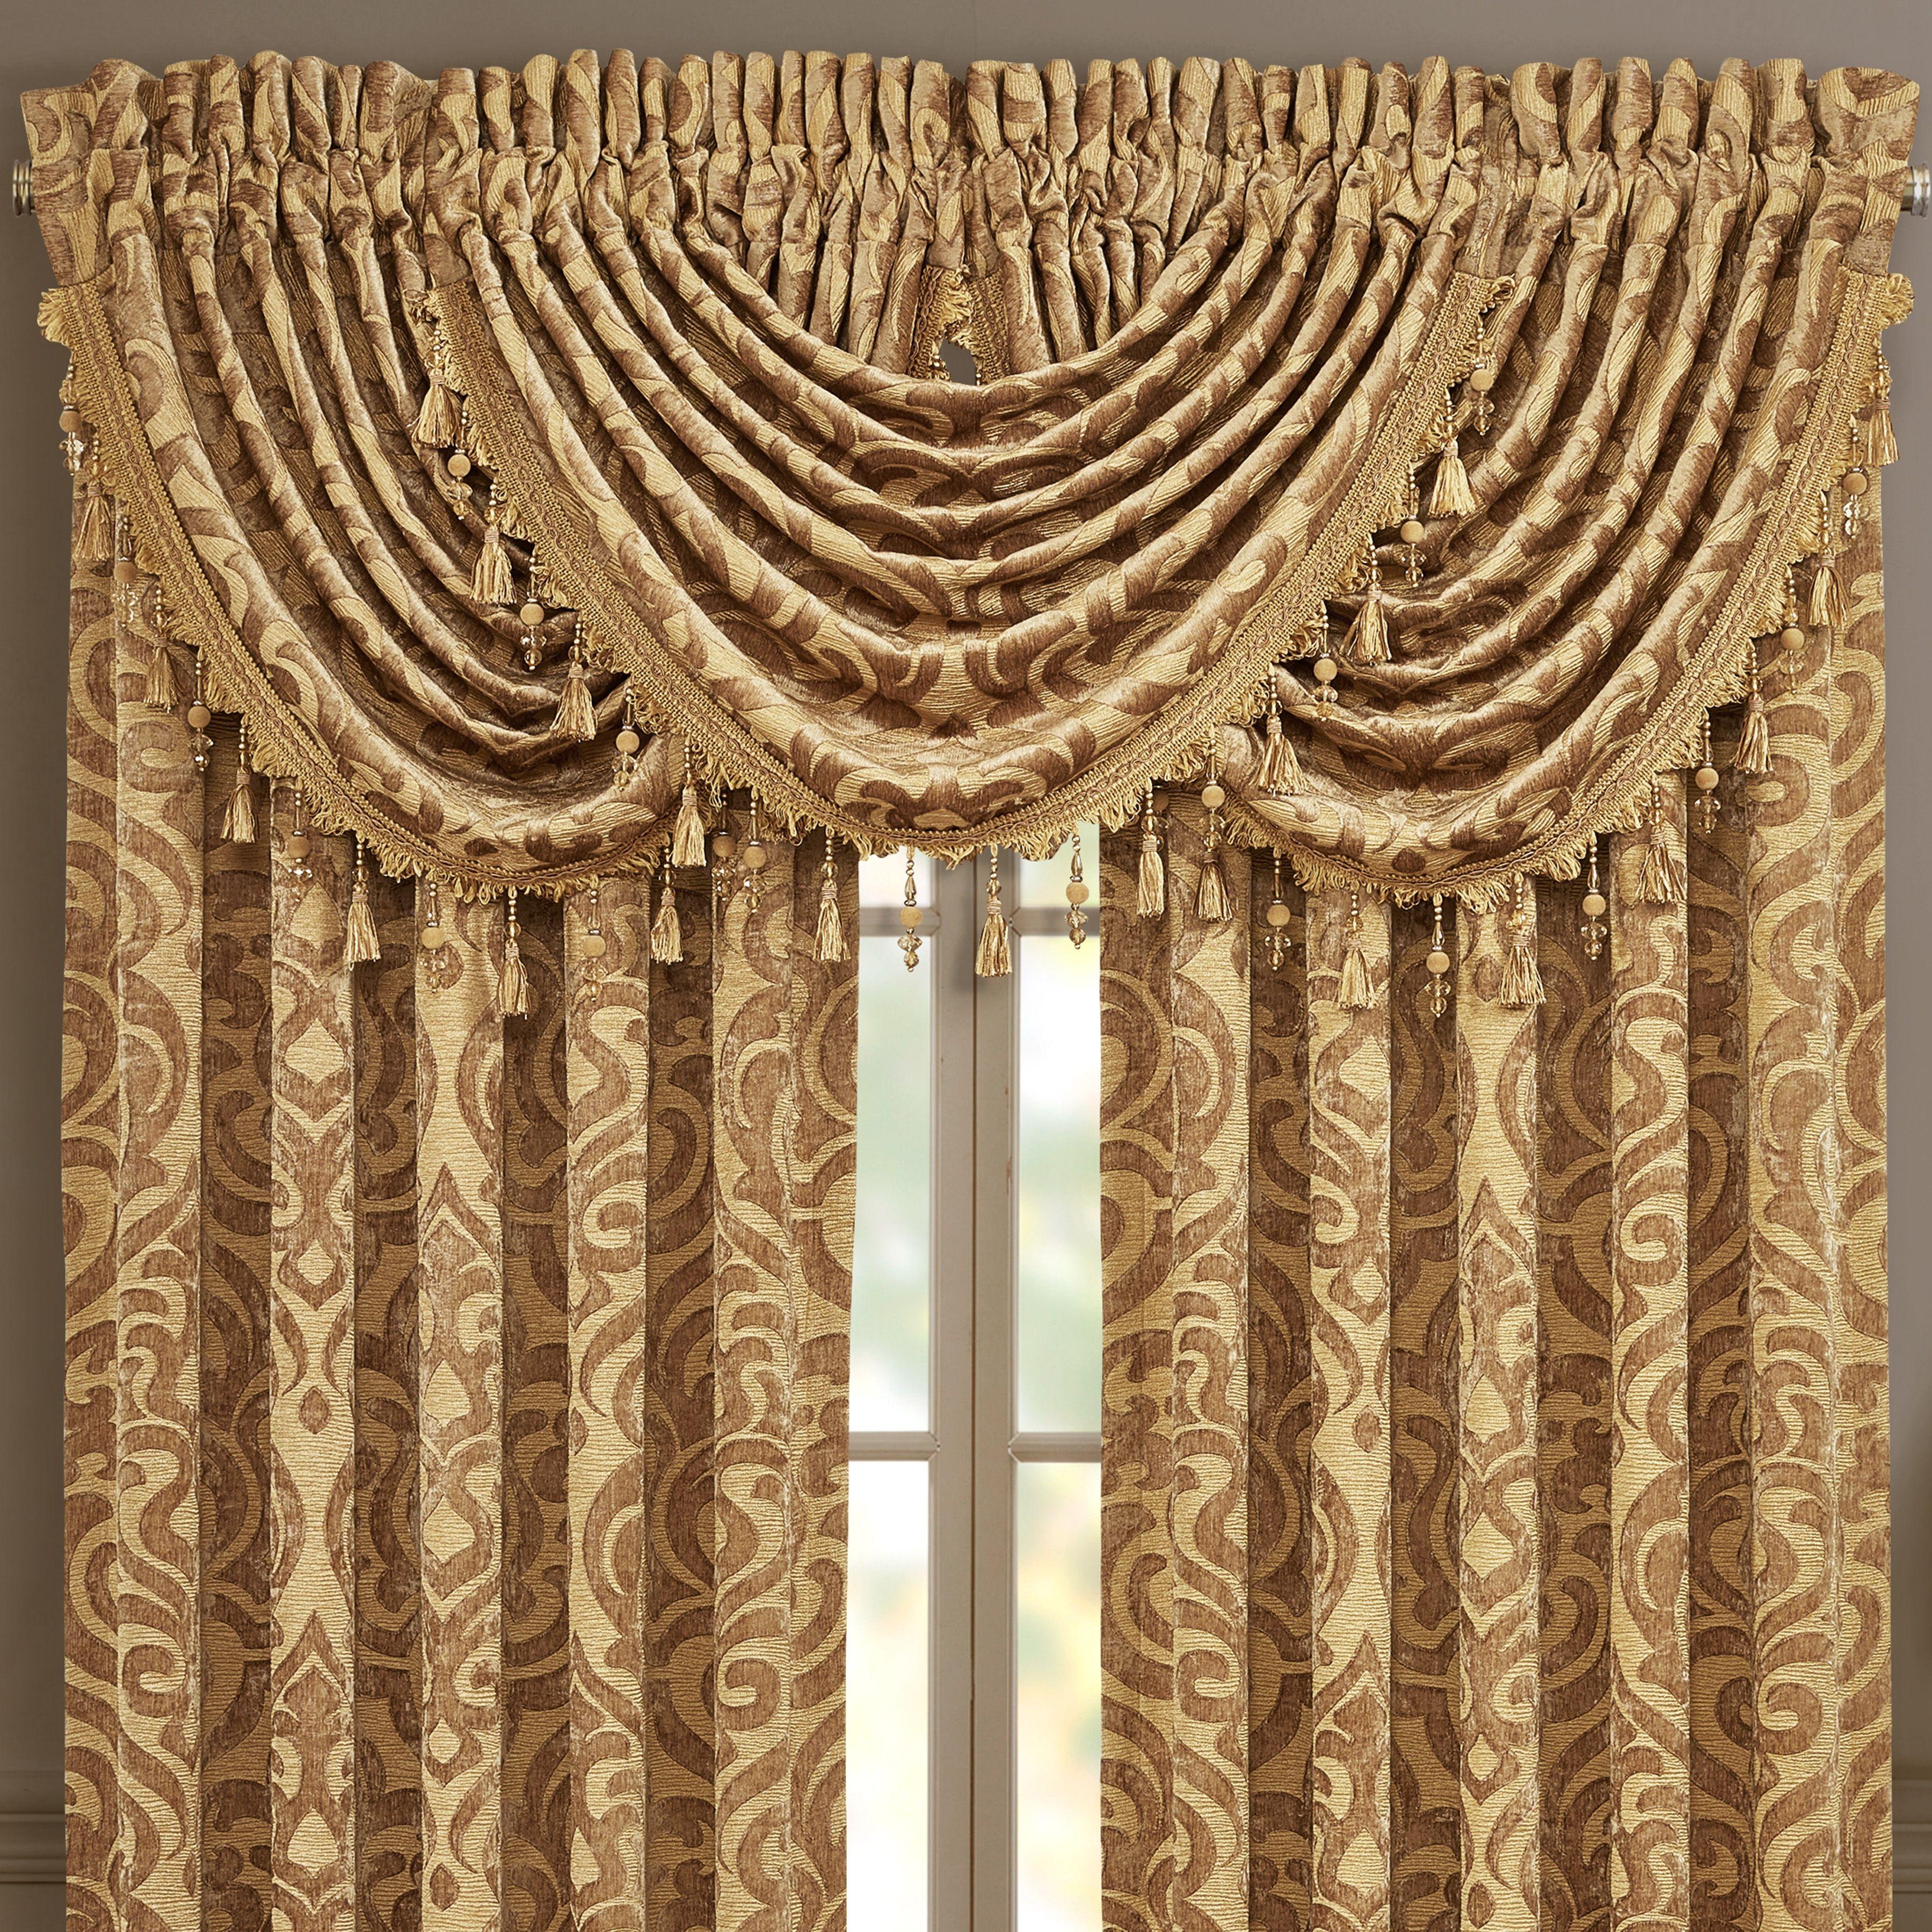 J Queen New York Sicily Gold Window Waterfall Valance Gold Gold Window Treatments Waterfall Valance Valance